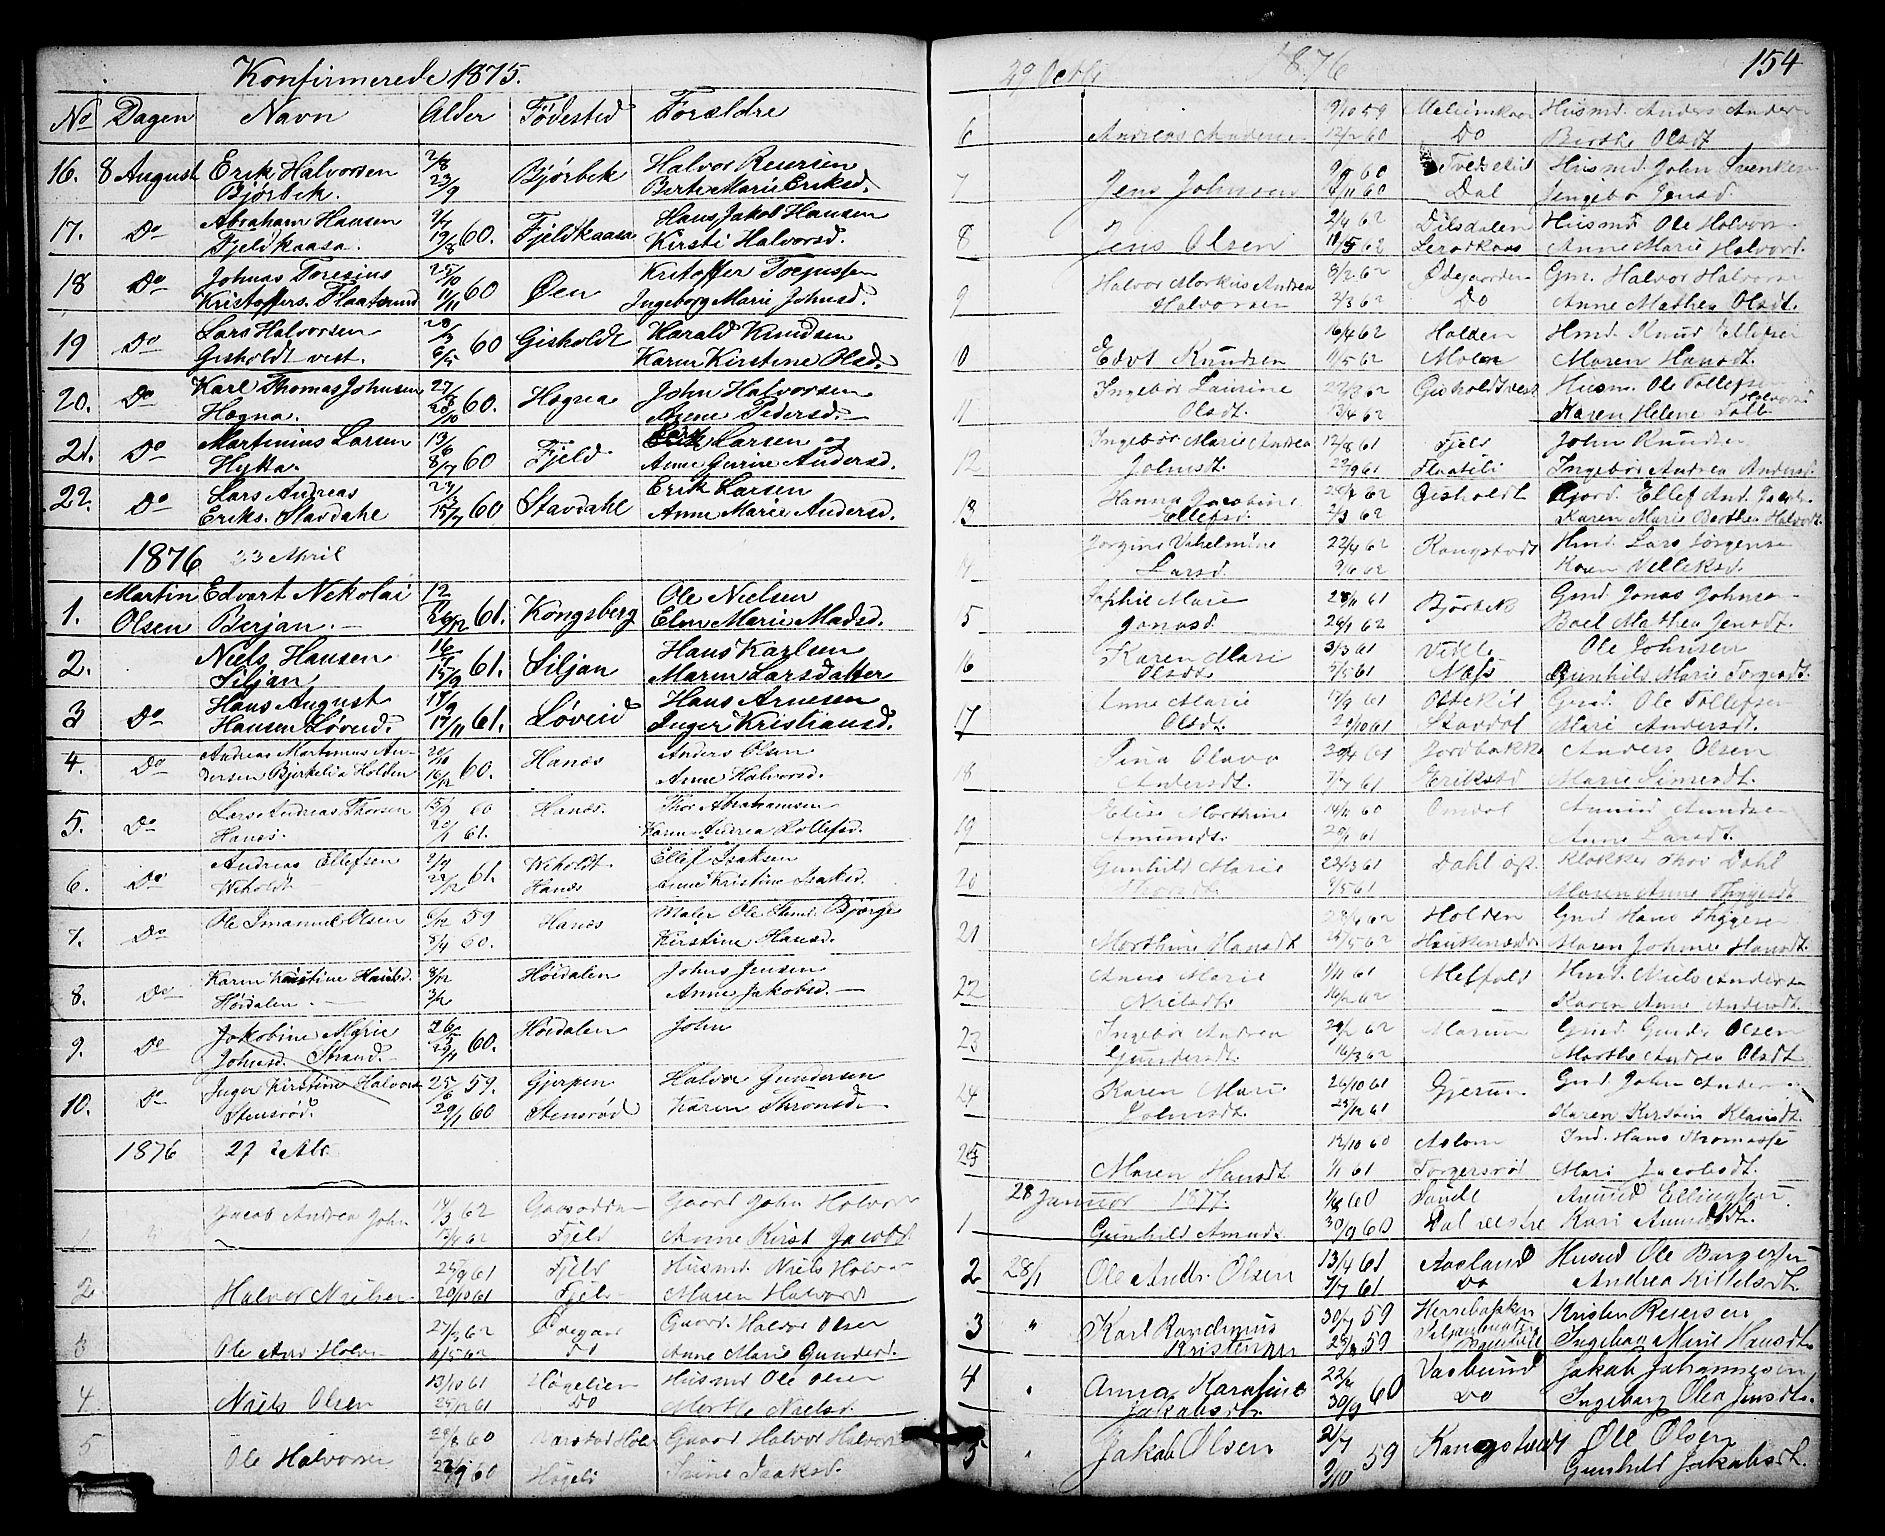 SAKO, Solum kirkebøker, G/Gb/L0002: Klokkerbok nr. II 2, 1859-1879, s. 154